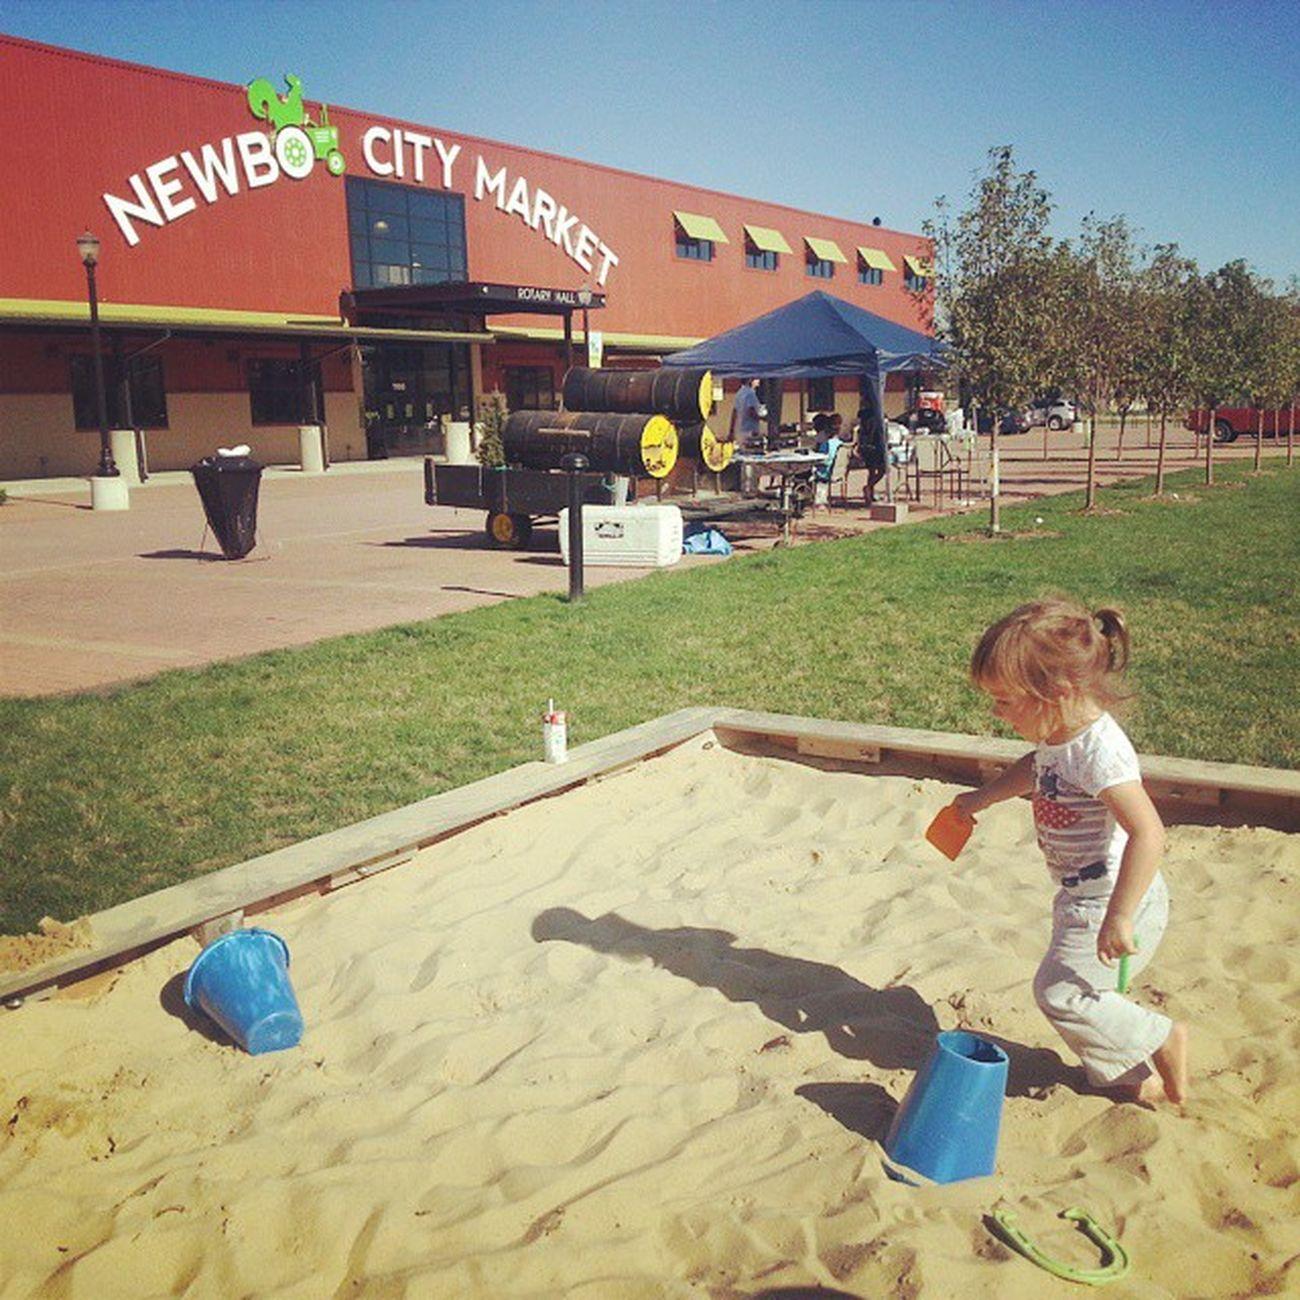 SeptemberFun at the Sandbox at NewBo